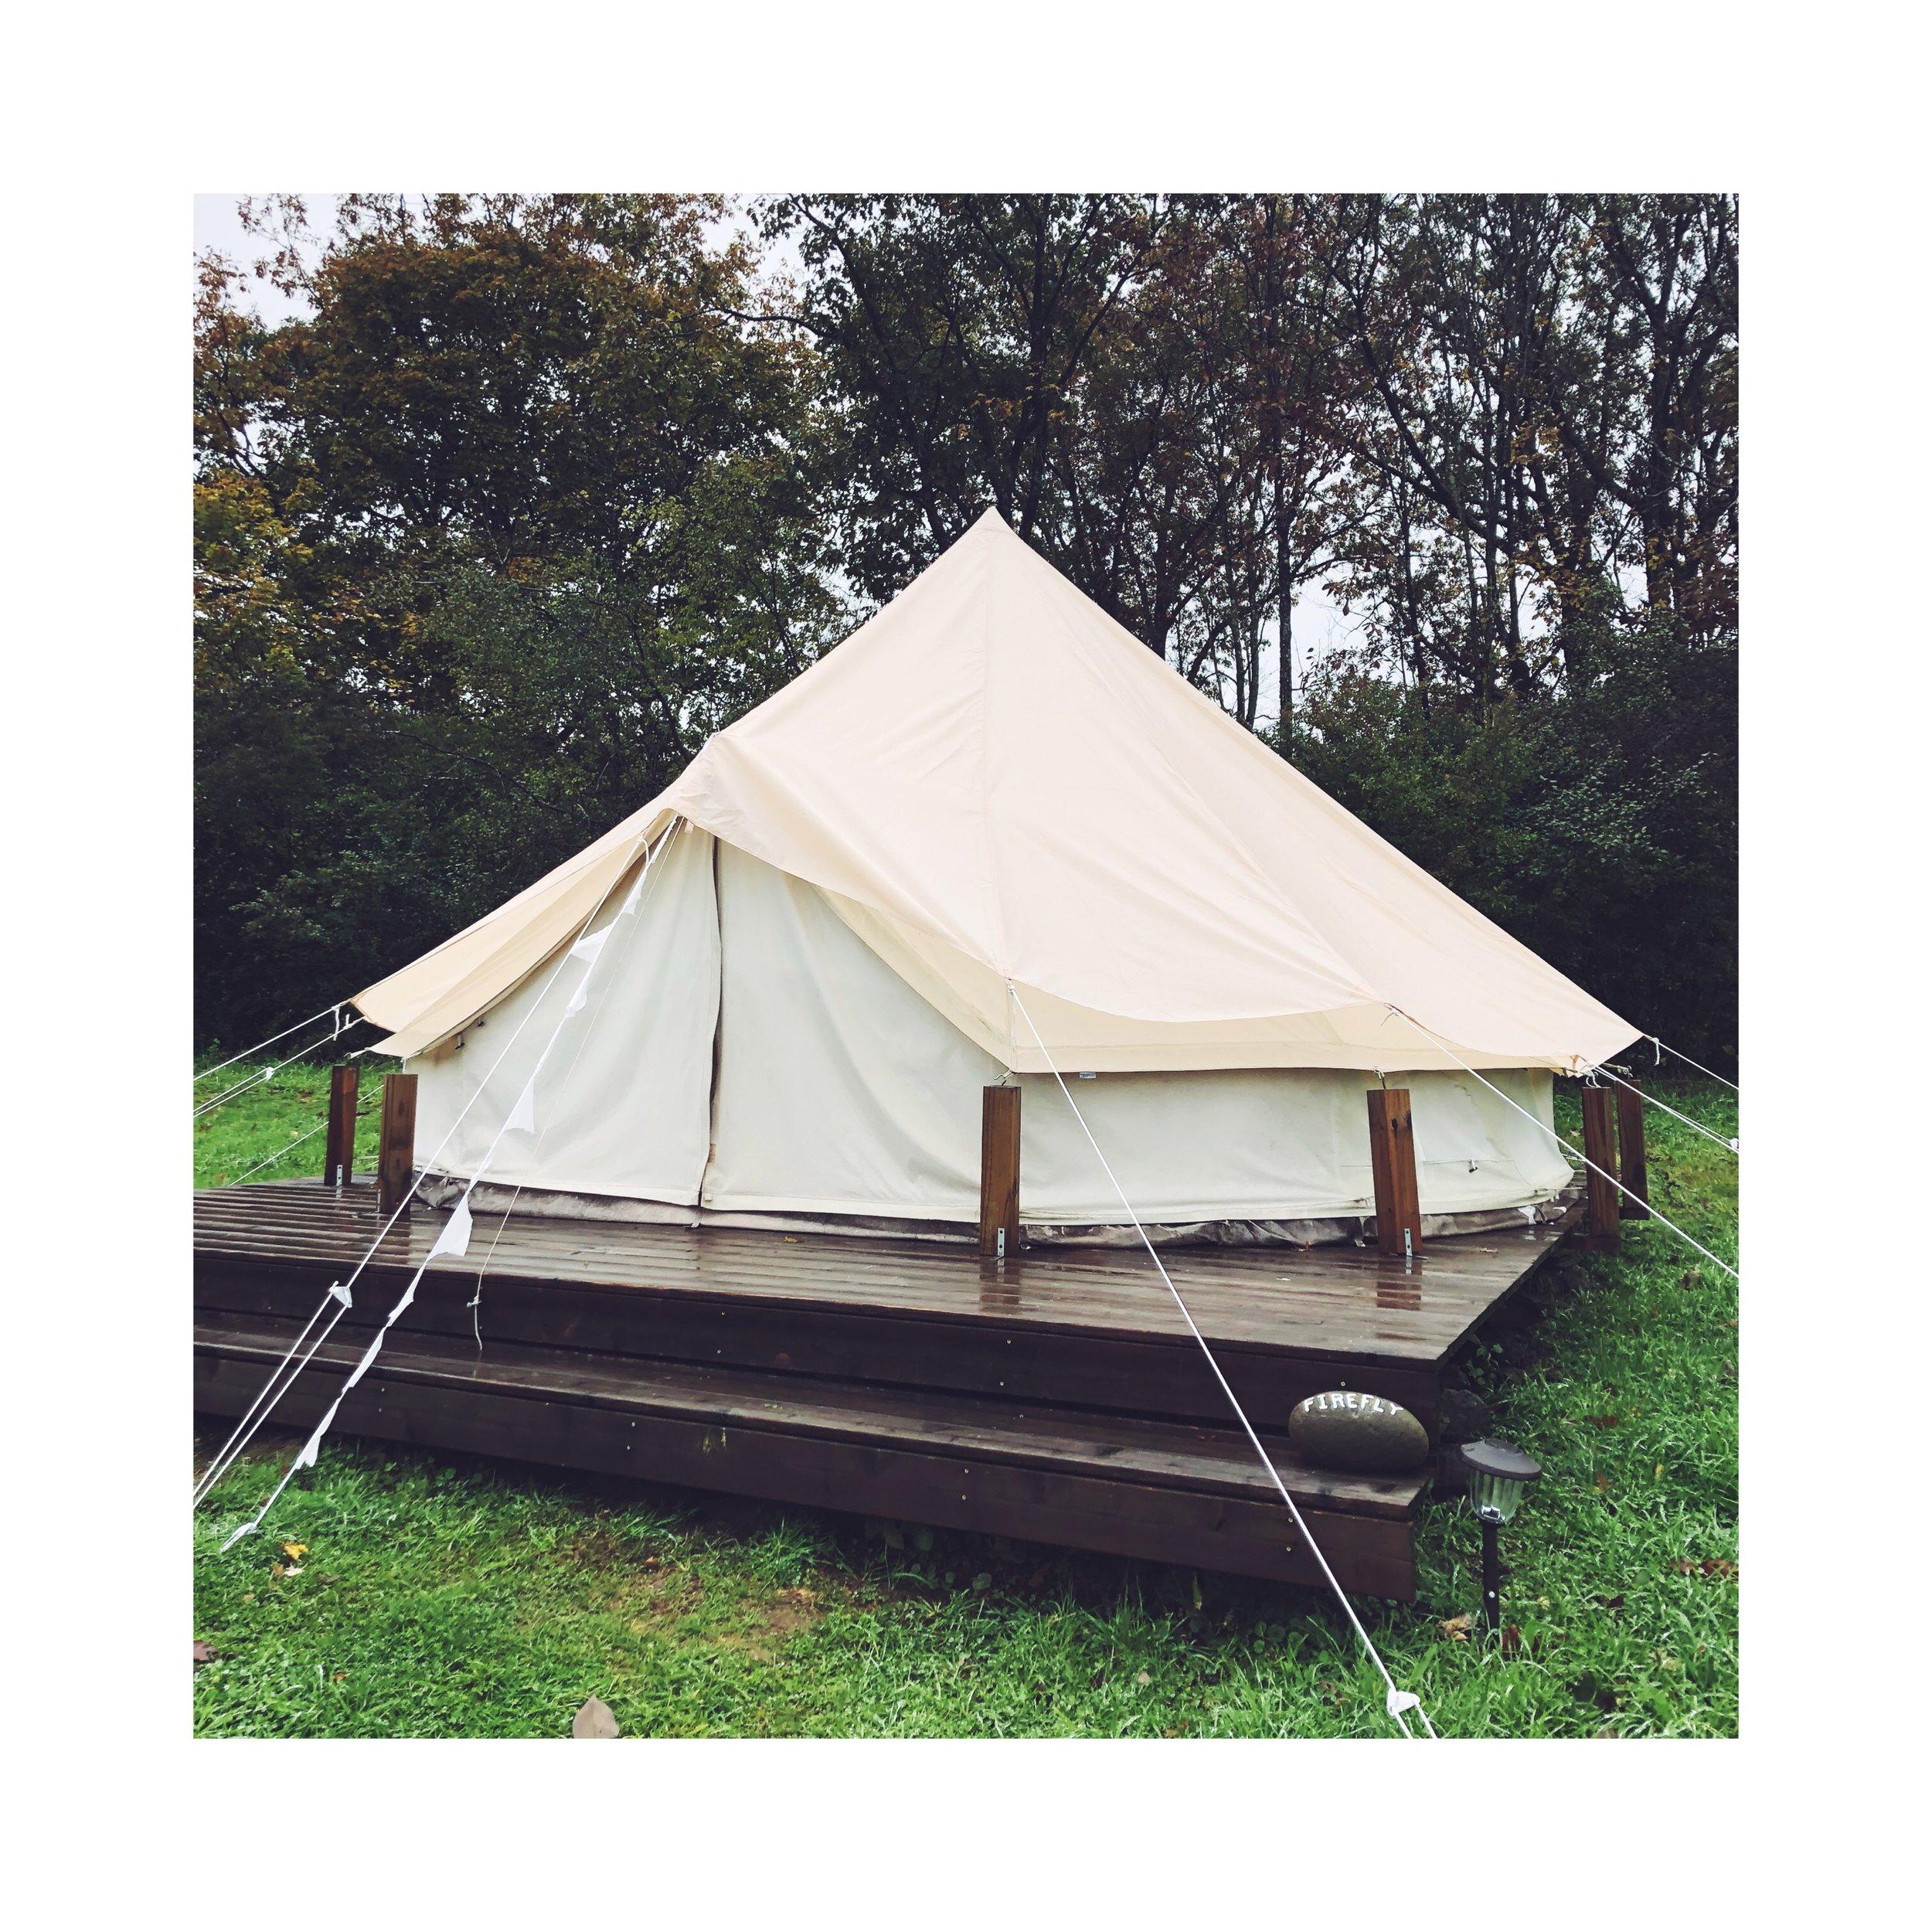 JoyForm_Space Series_Tent